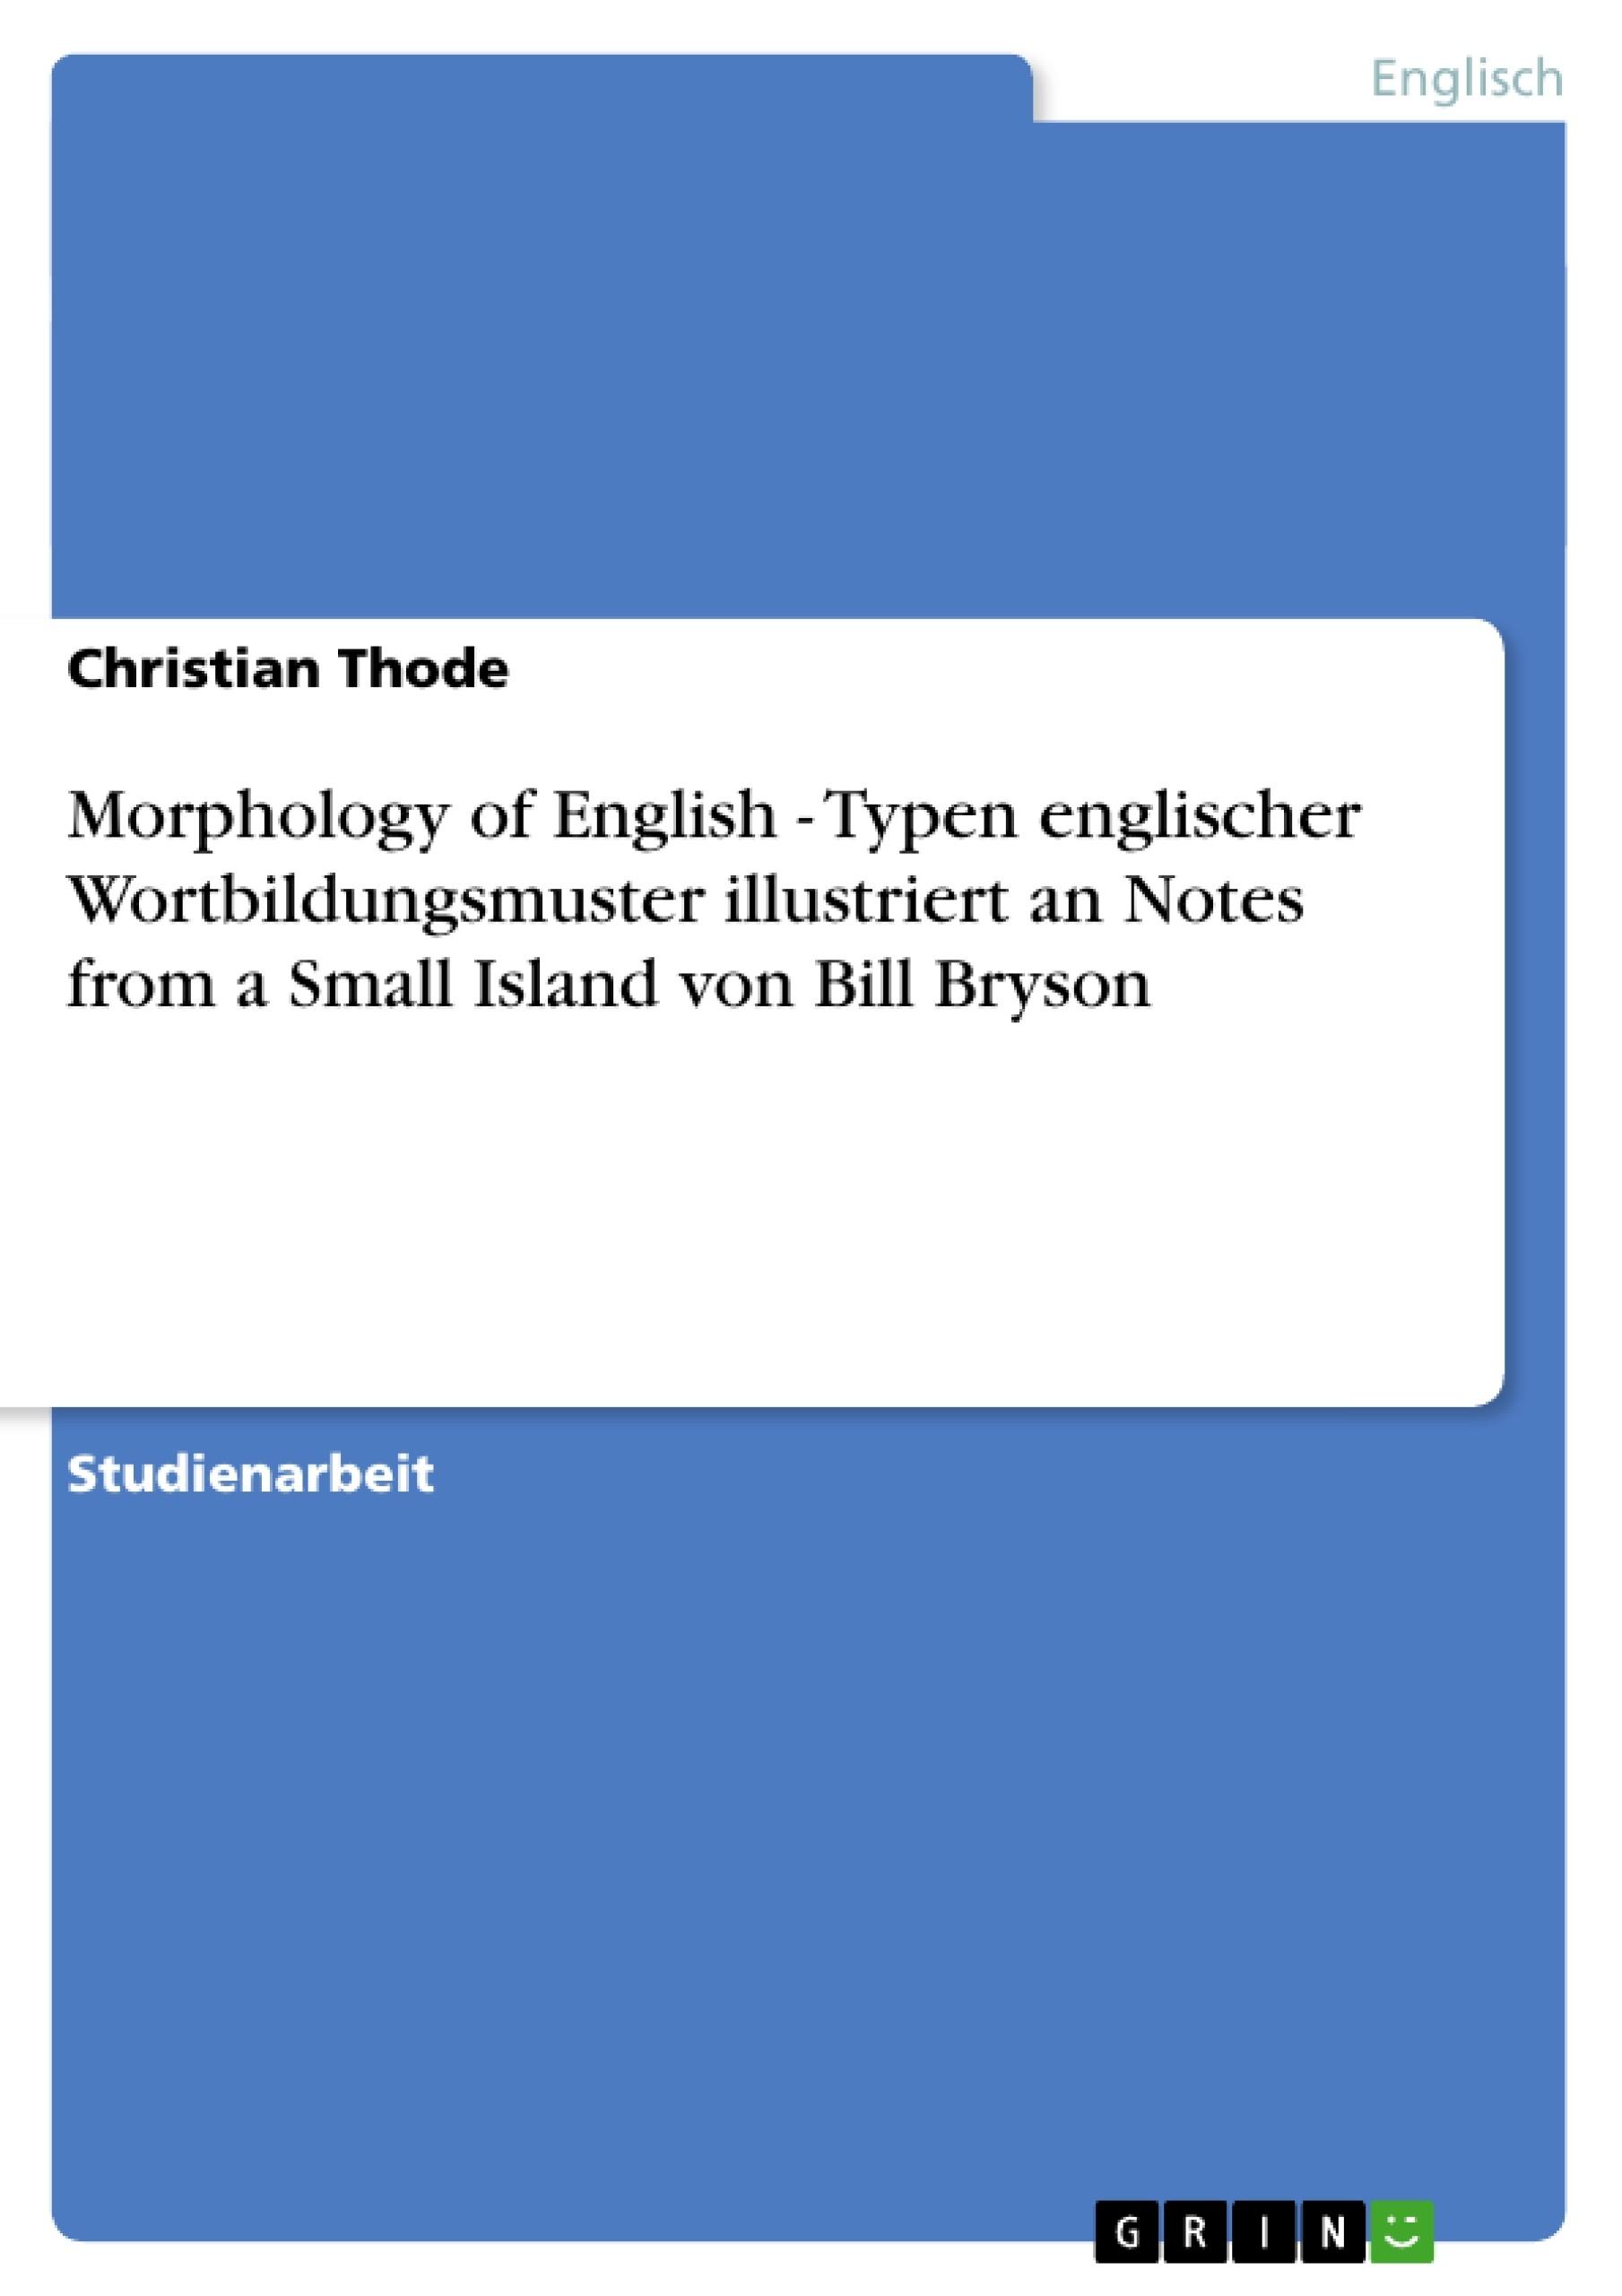 Titel: Morphology of English - Typen englischer Wortbildungsmuster illustriert an Notes from a Small Island von Bill Bryson